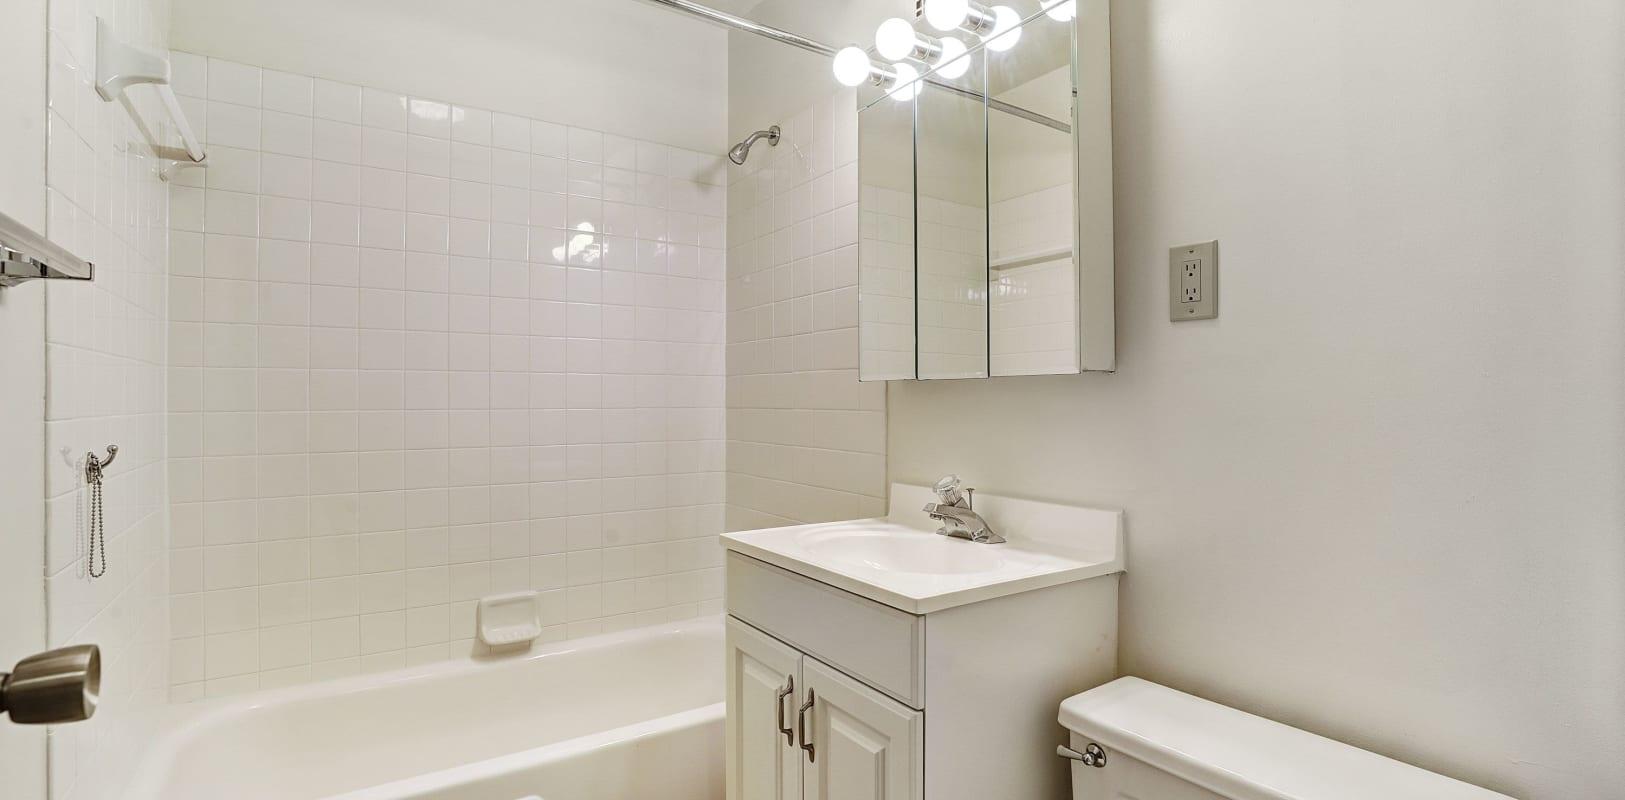 Clean bathroom at Bethlehem Towers in Bethlehem, Pennsylvania